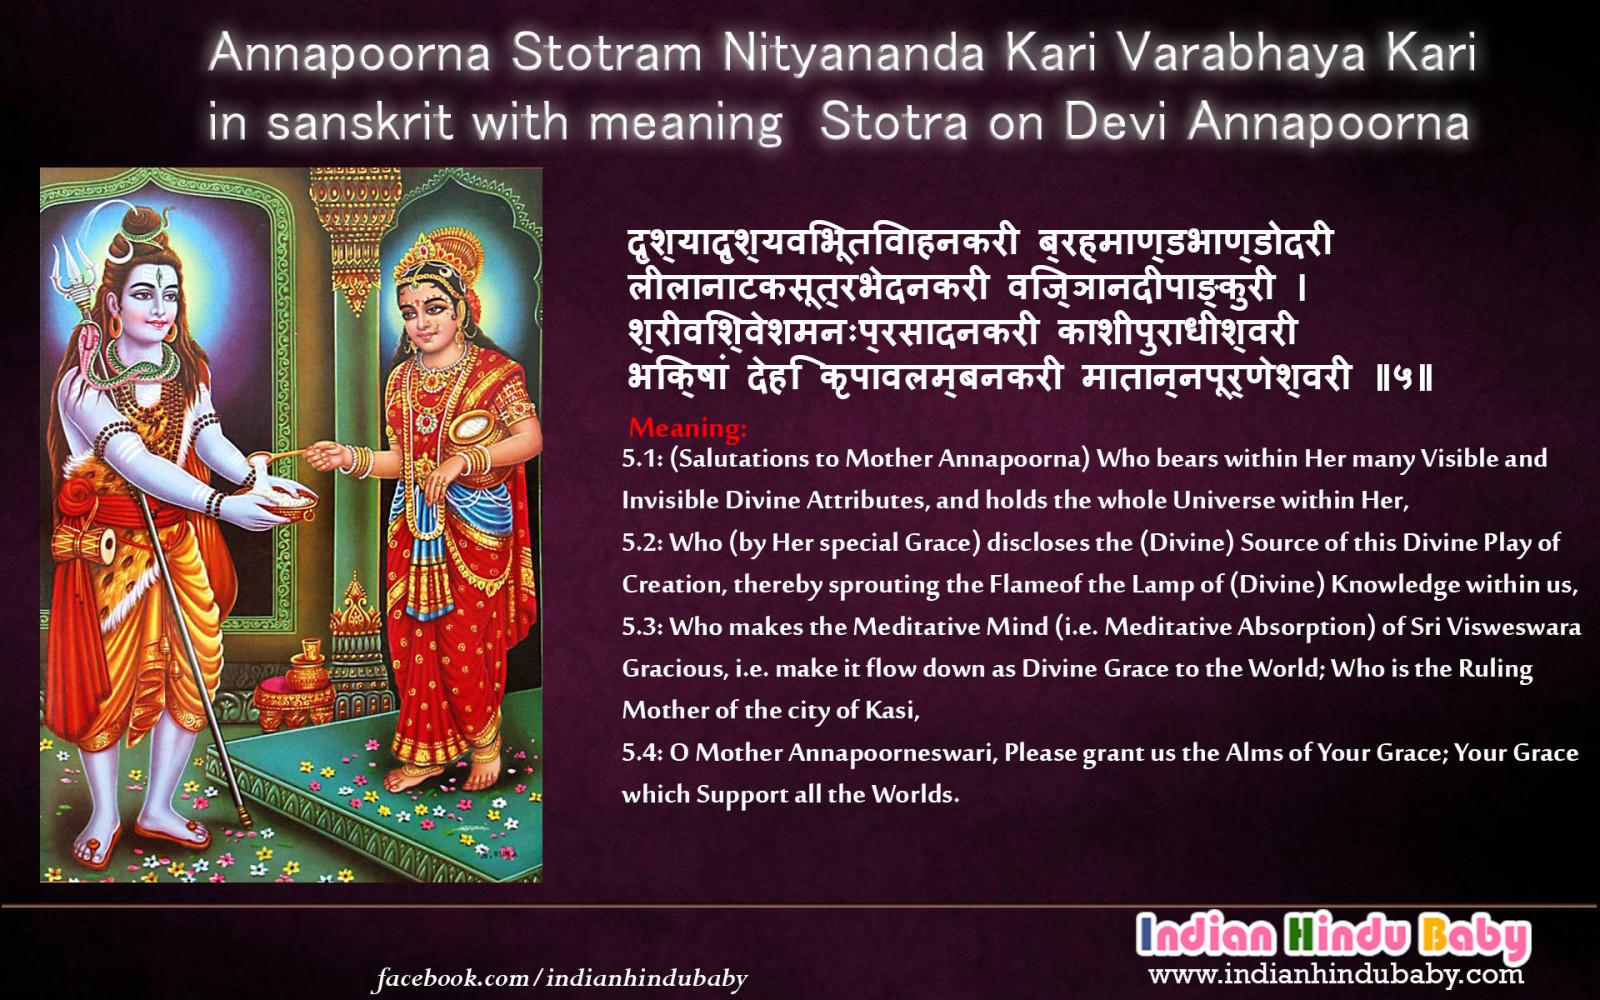 Annapoorna Stotram Nityananda Kari Varabhaya Kari in sanskrit with meaning Stotra on Devi Annapoorna-5